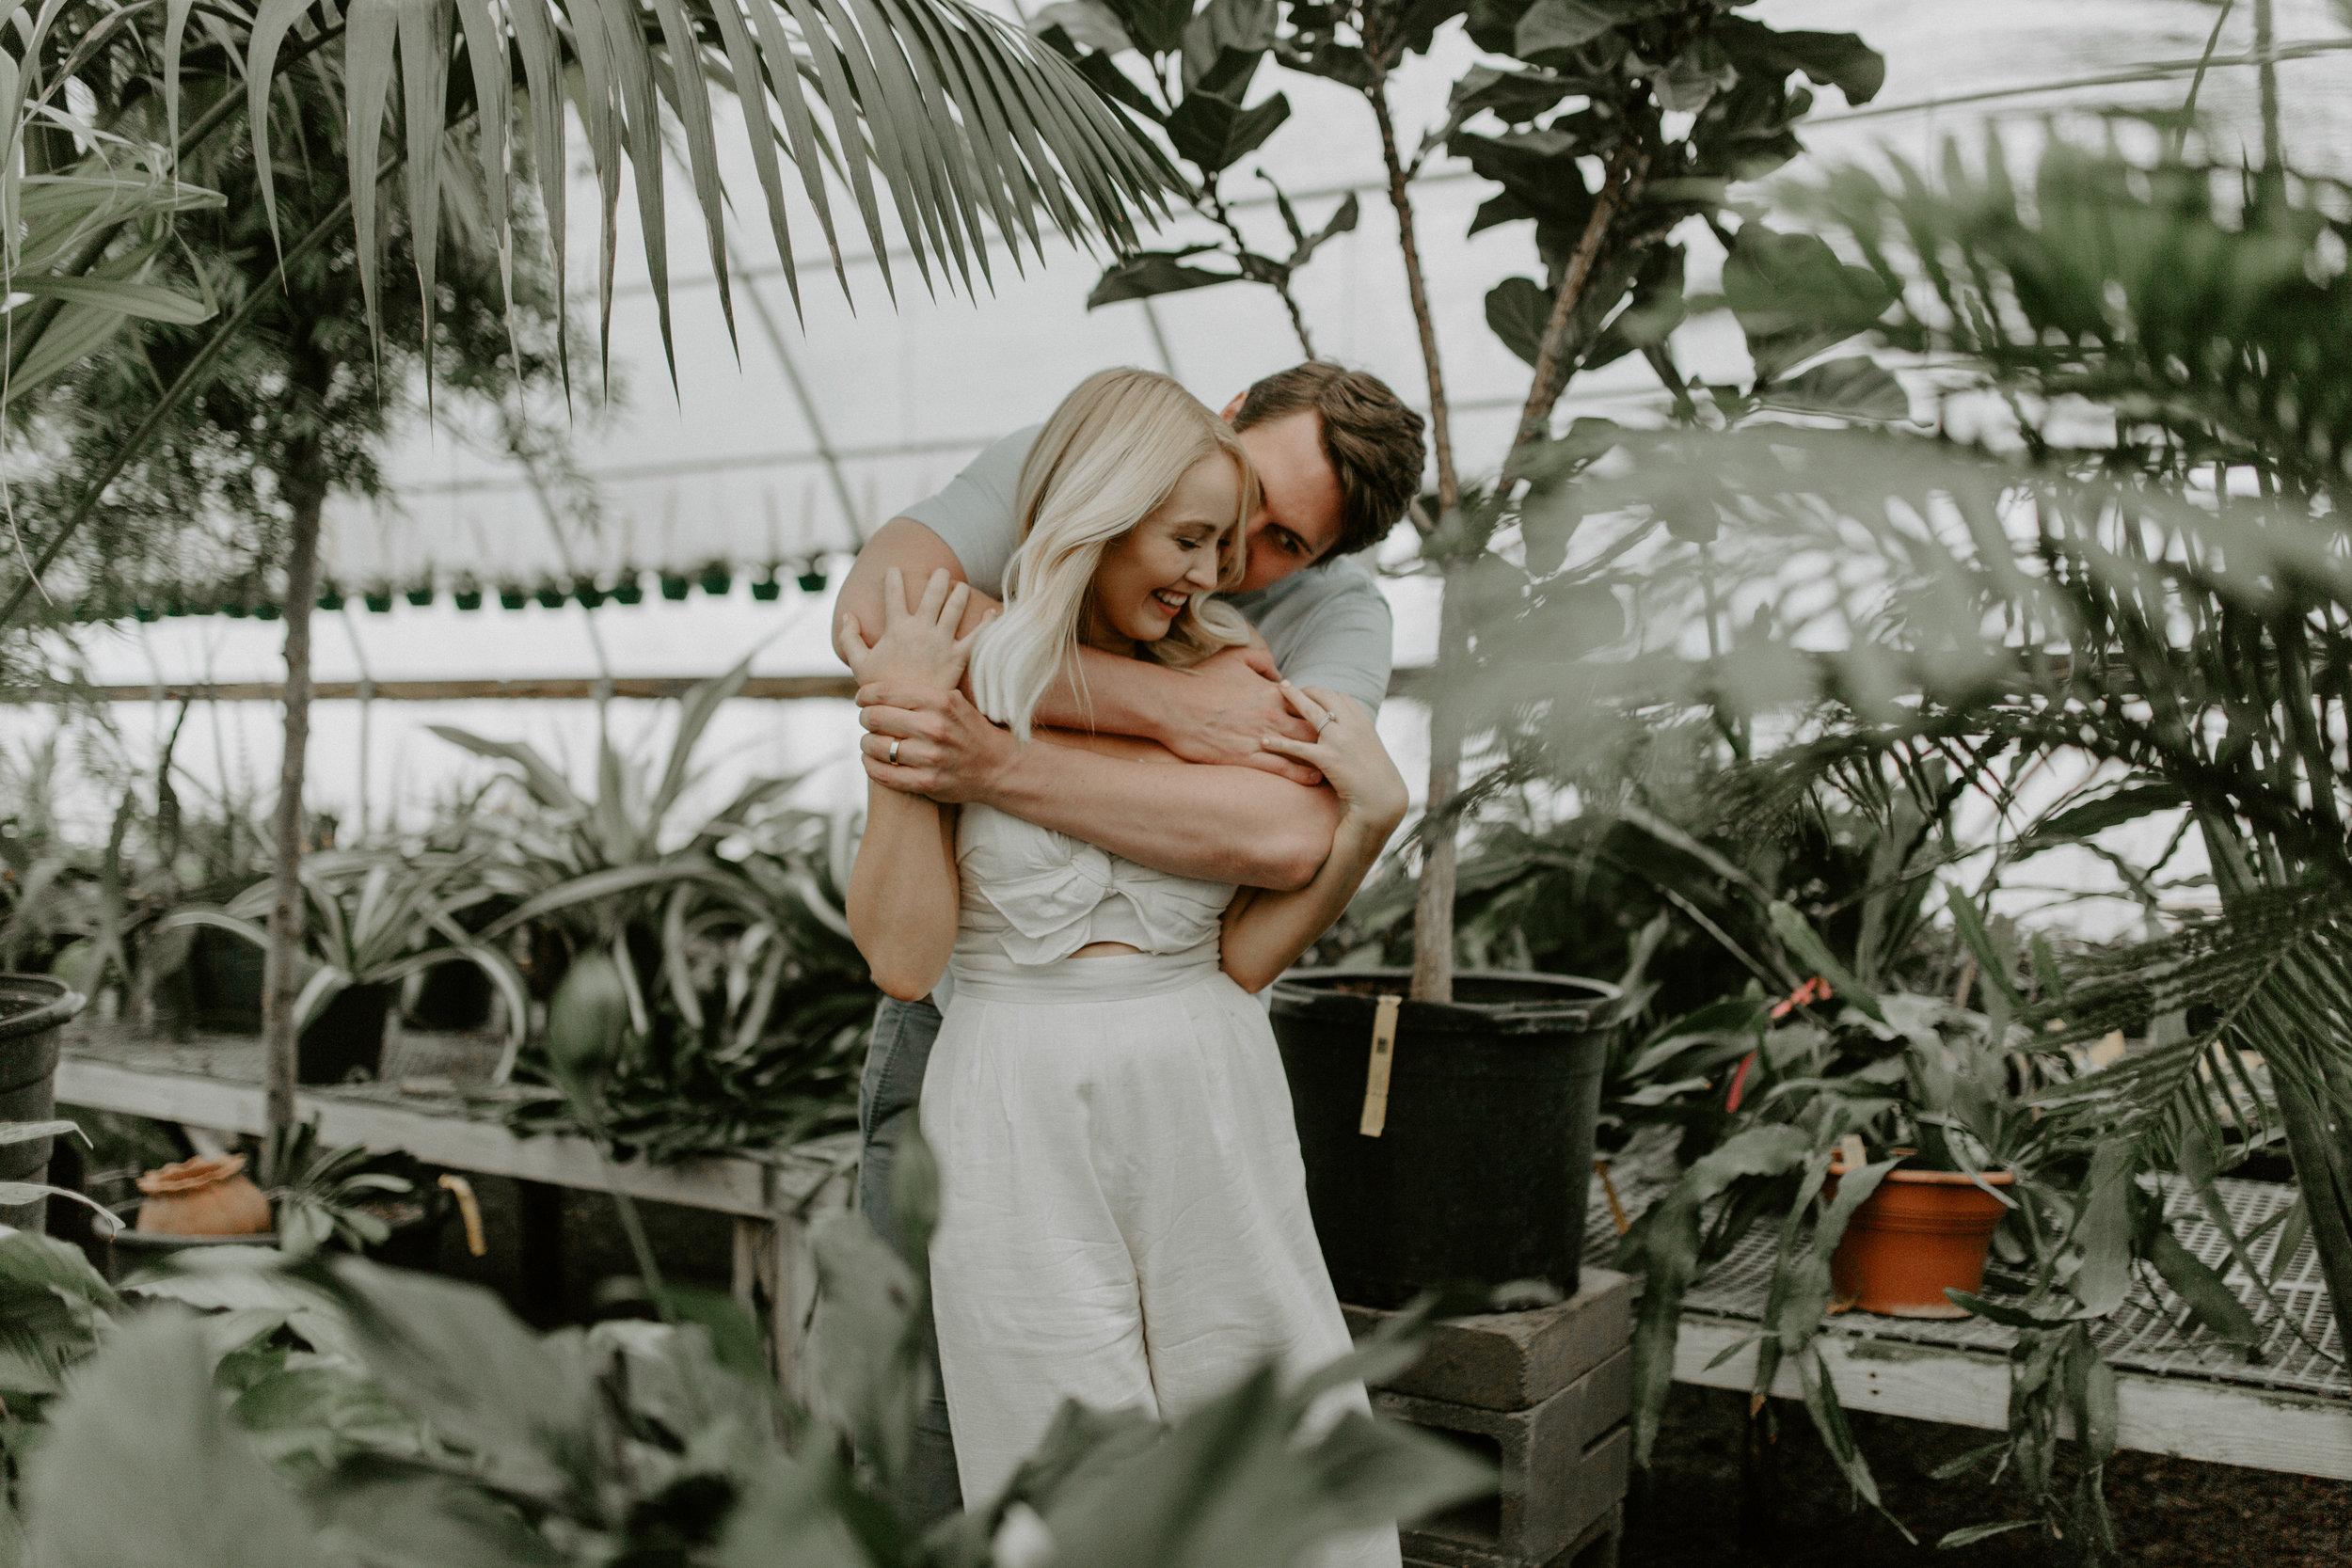 nashville_tn_wedding_photographer_collab_wright_photographs_0023.JPG